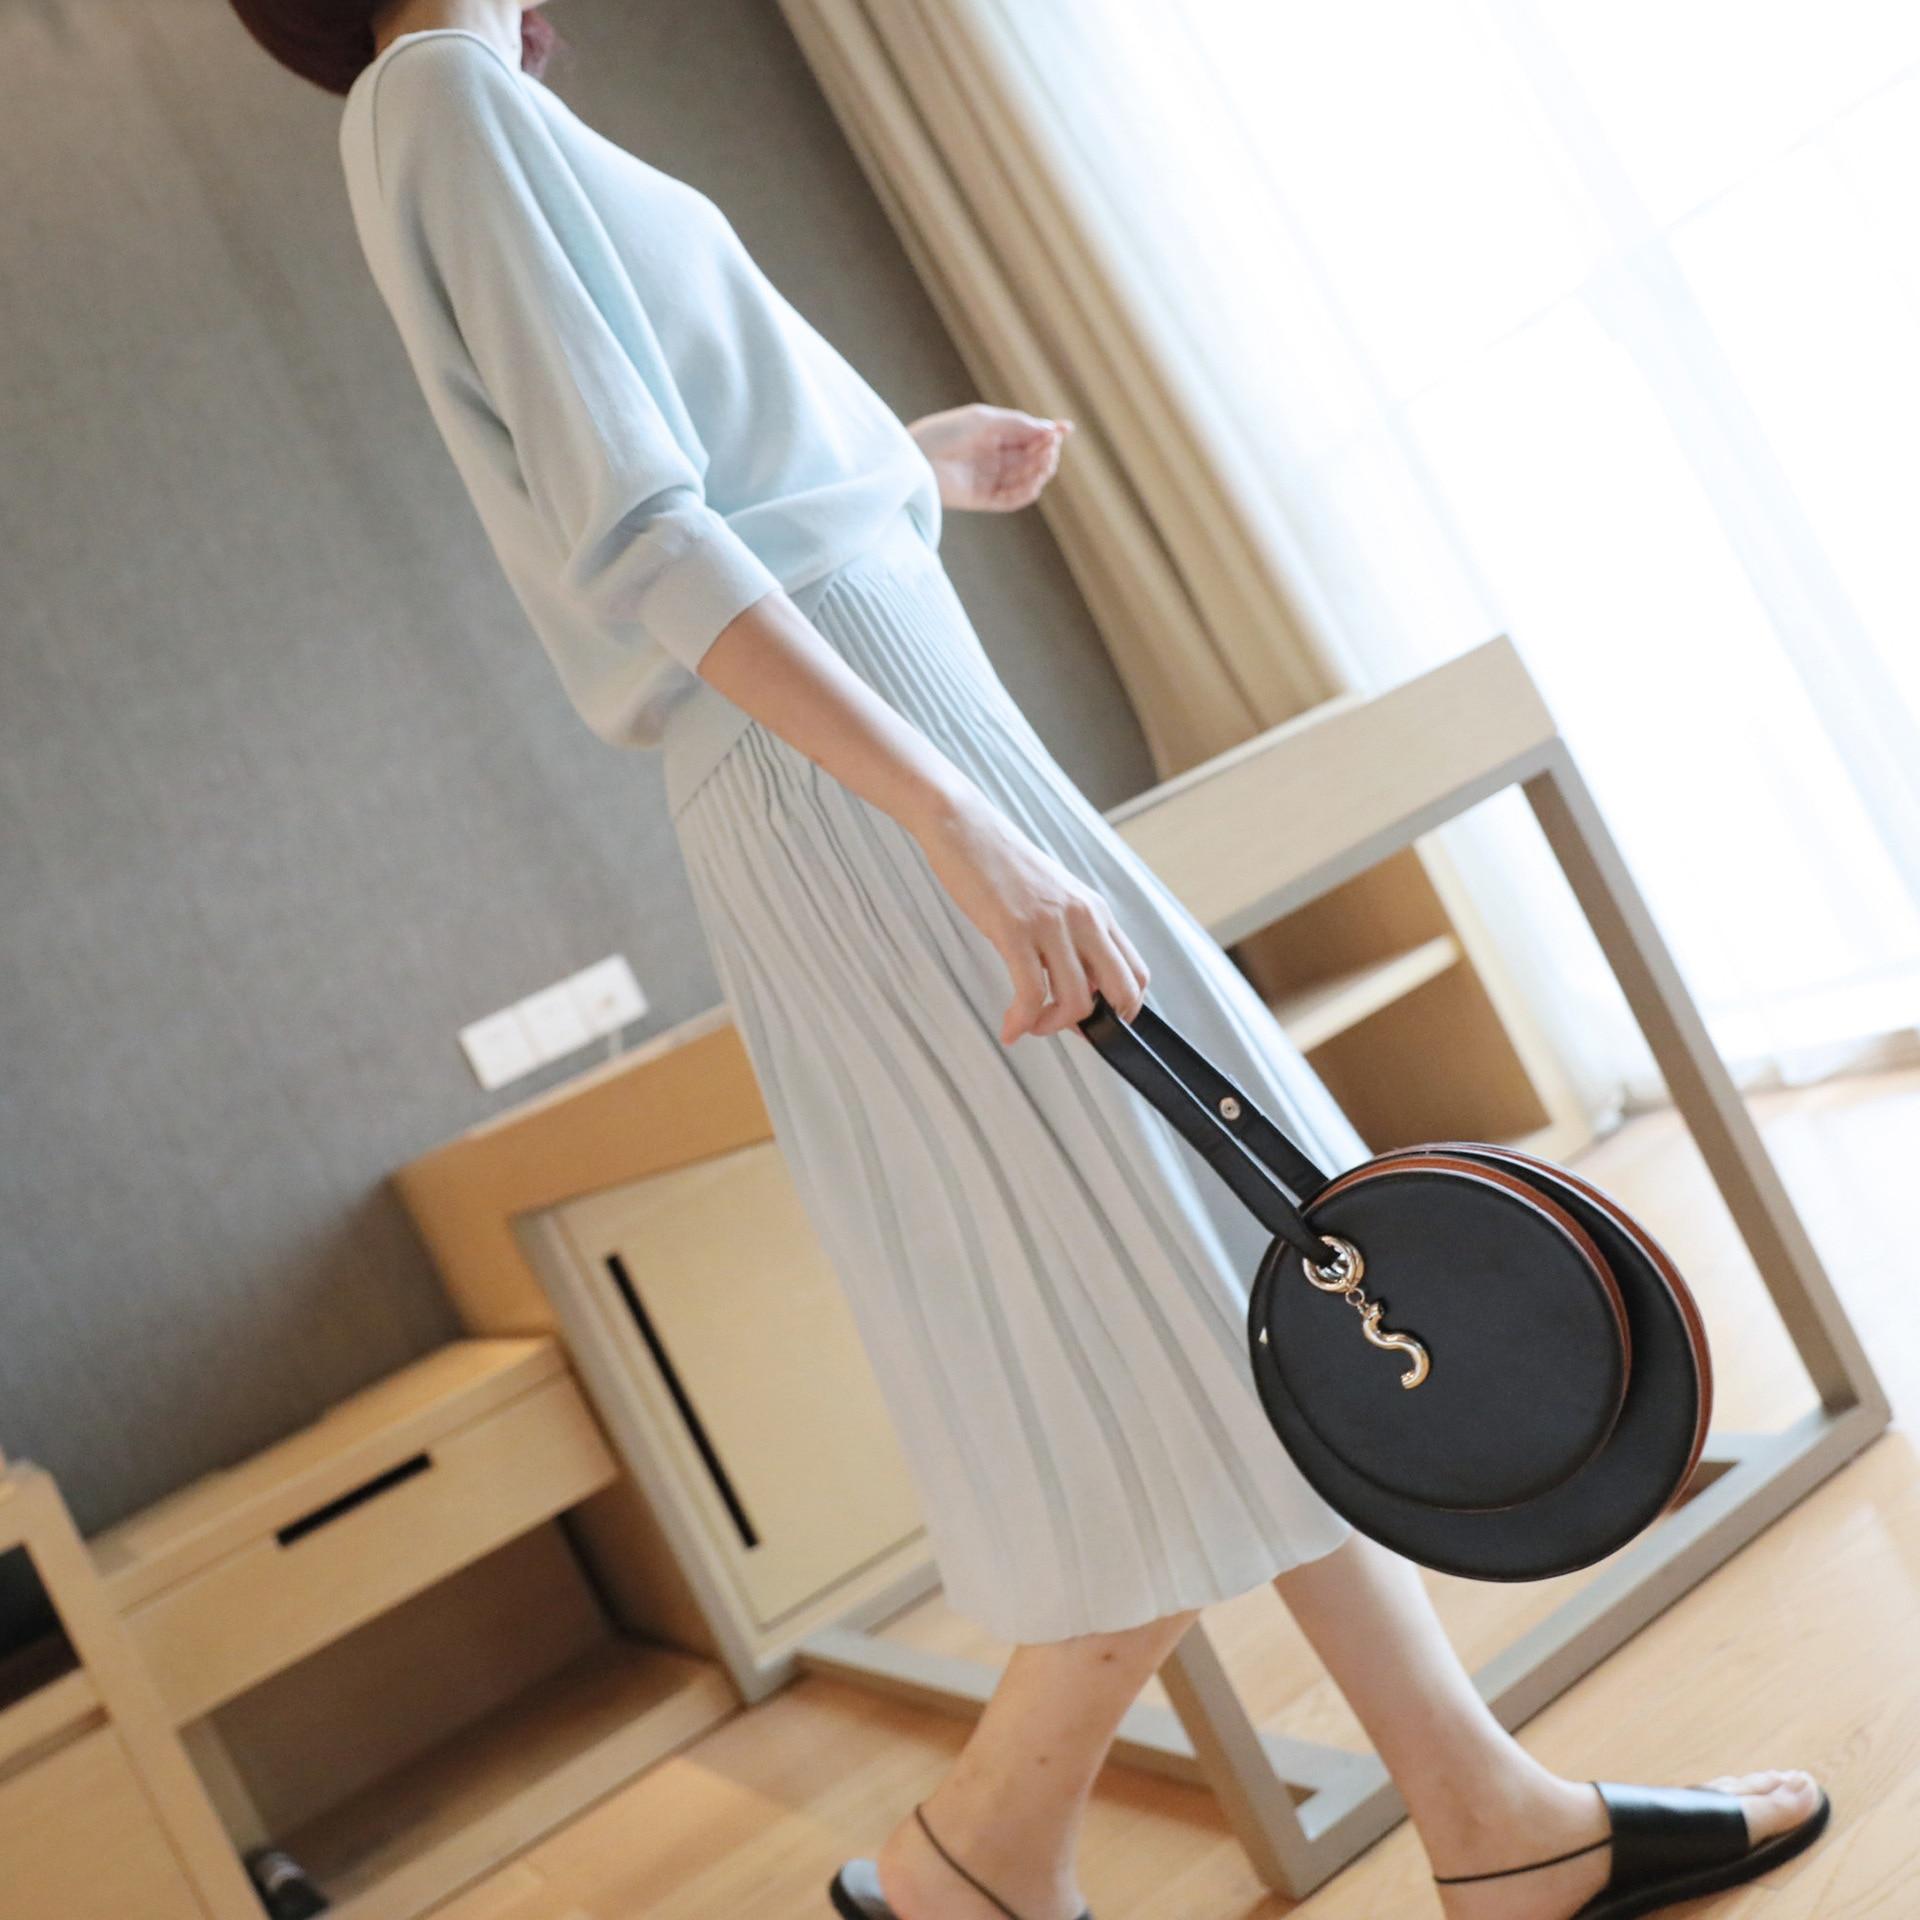 Las blue Falda 2018 black Traje Dos Punto Piezas De Nuevo Flojo Apricot Otoño Temperamento Moda Suéter Mujeres 5XwavpqB